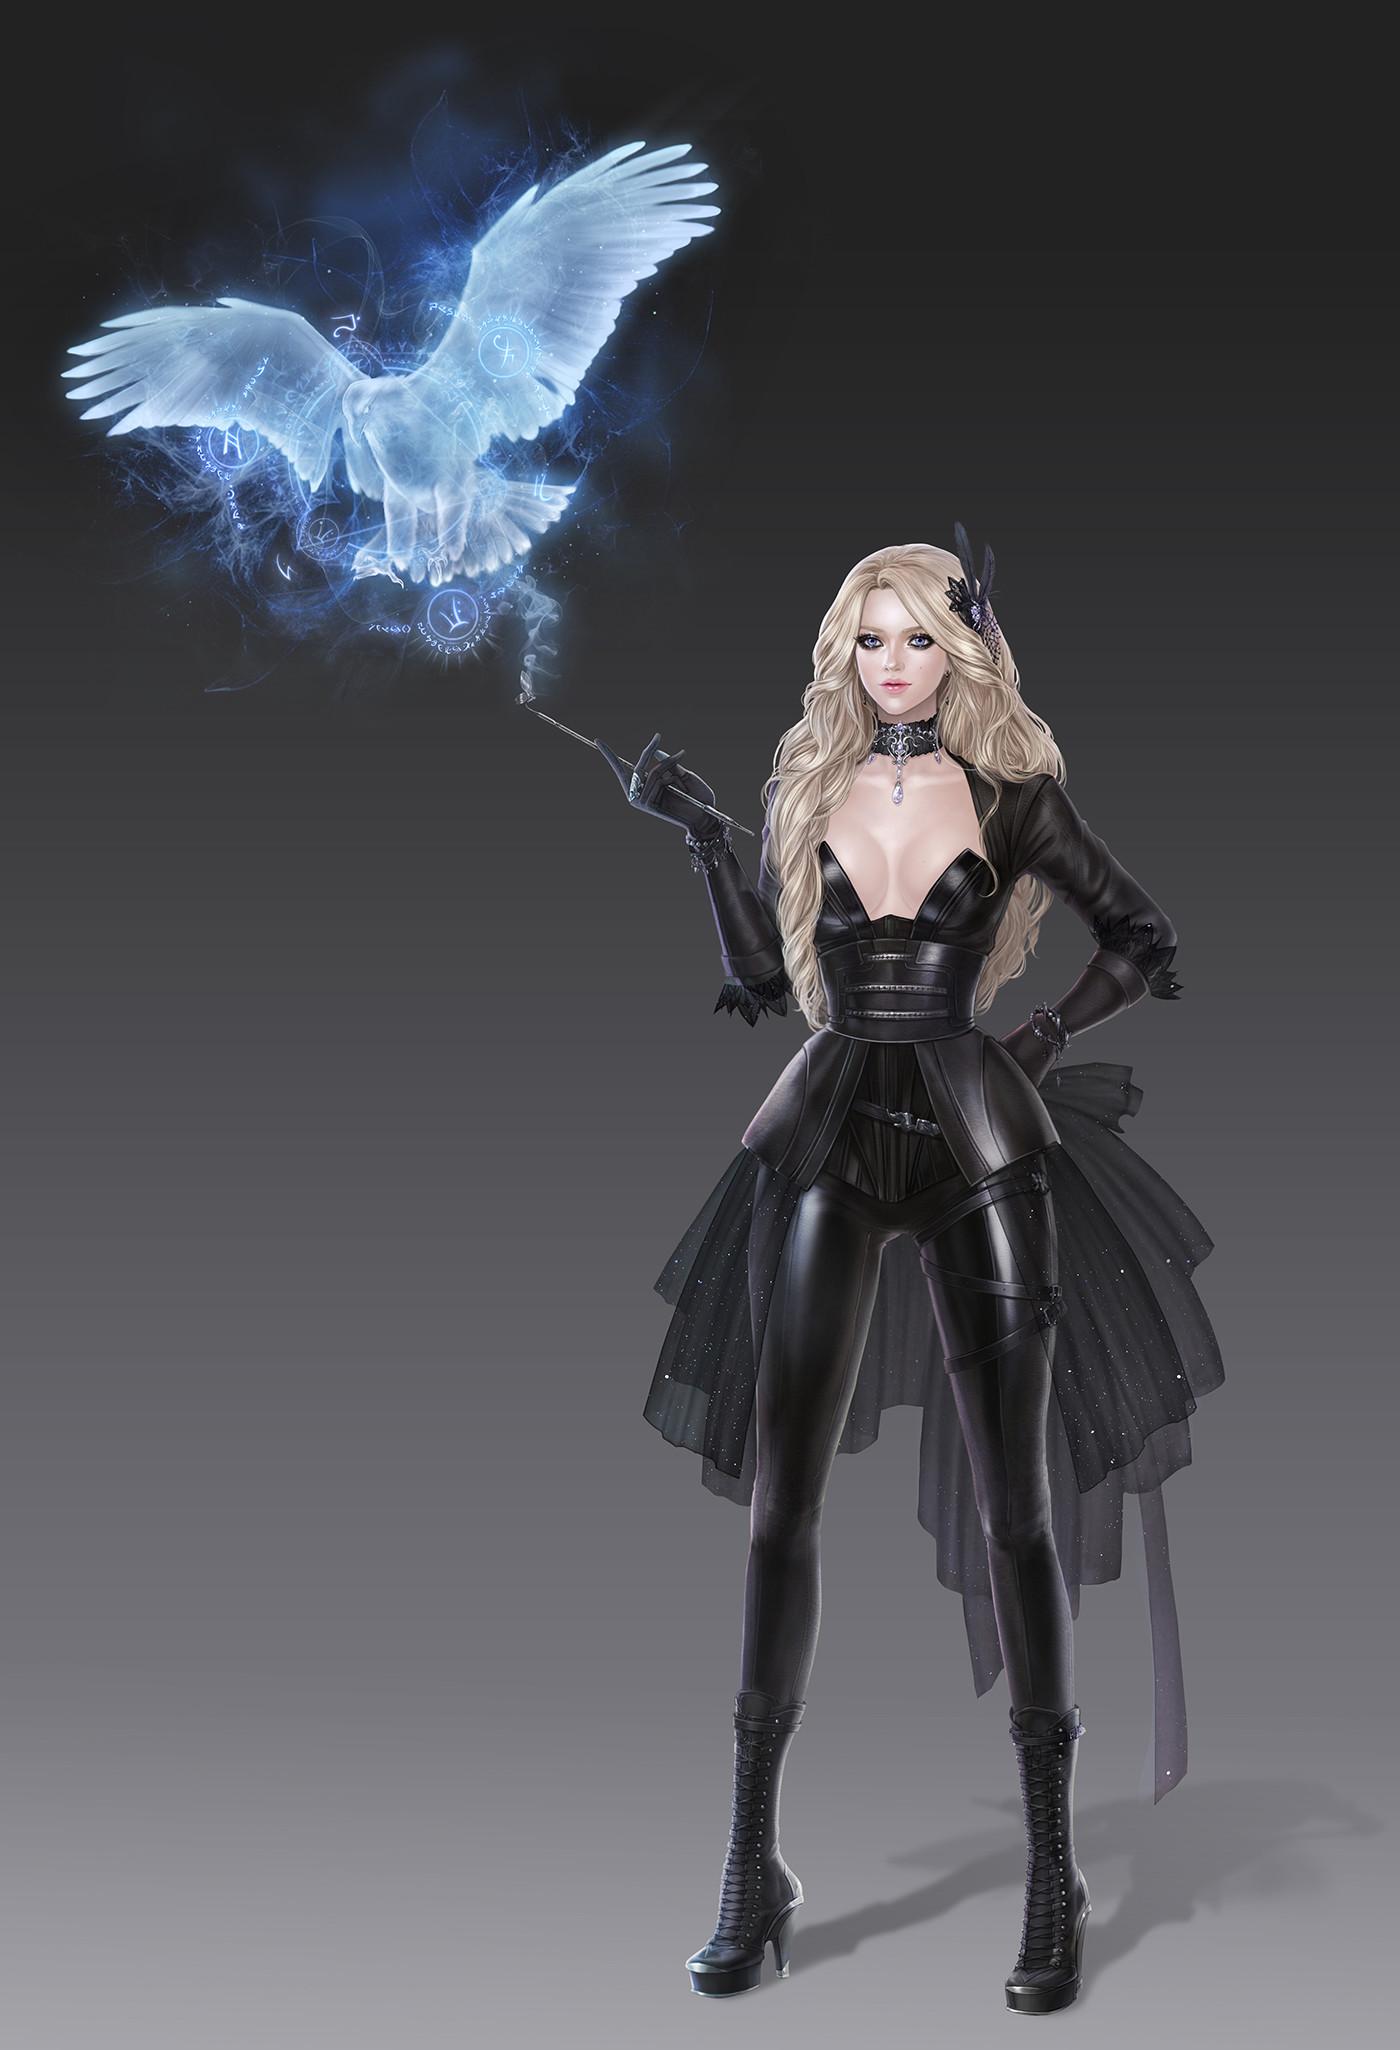 Sorceress Backgrounds, Compatible - PC, Mobile, Gadgets| 1400x2050 px